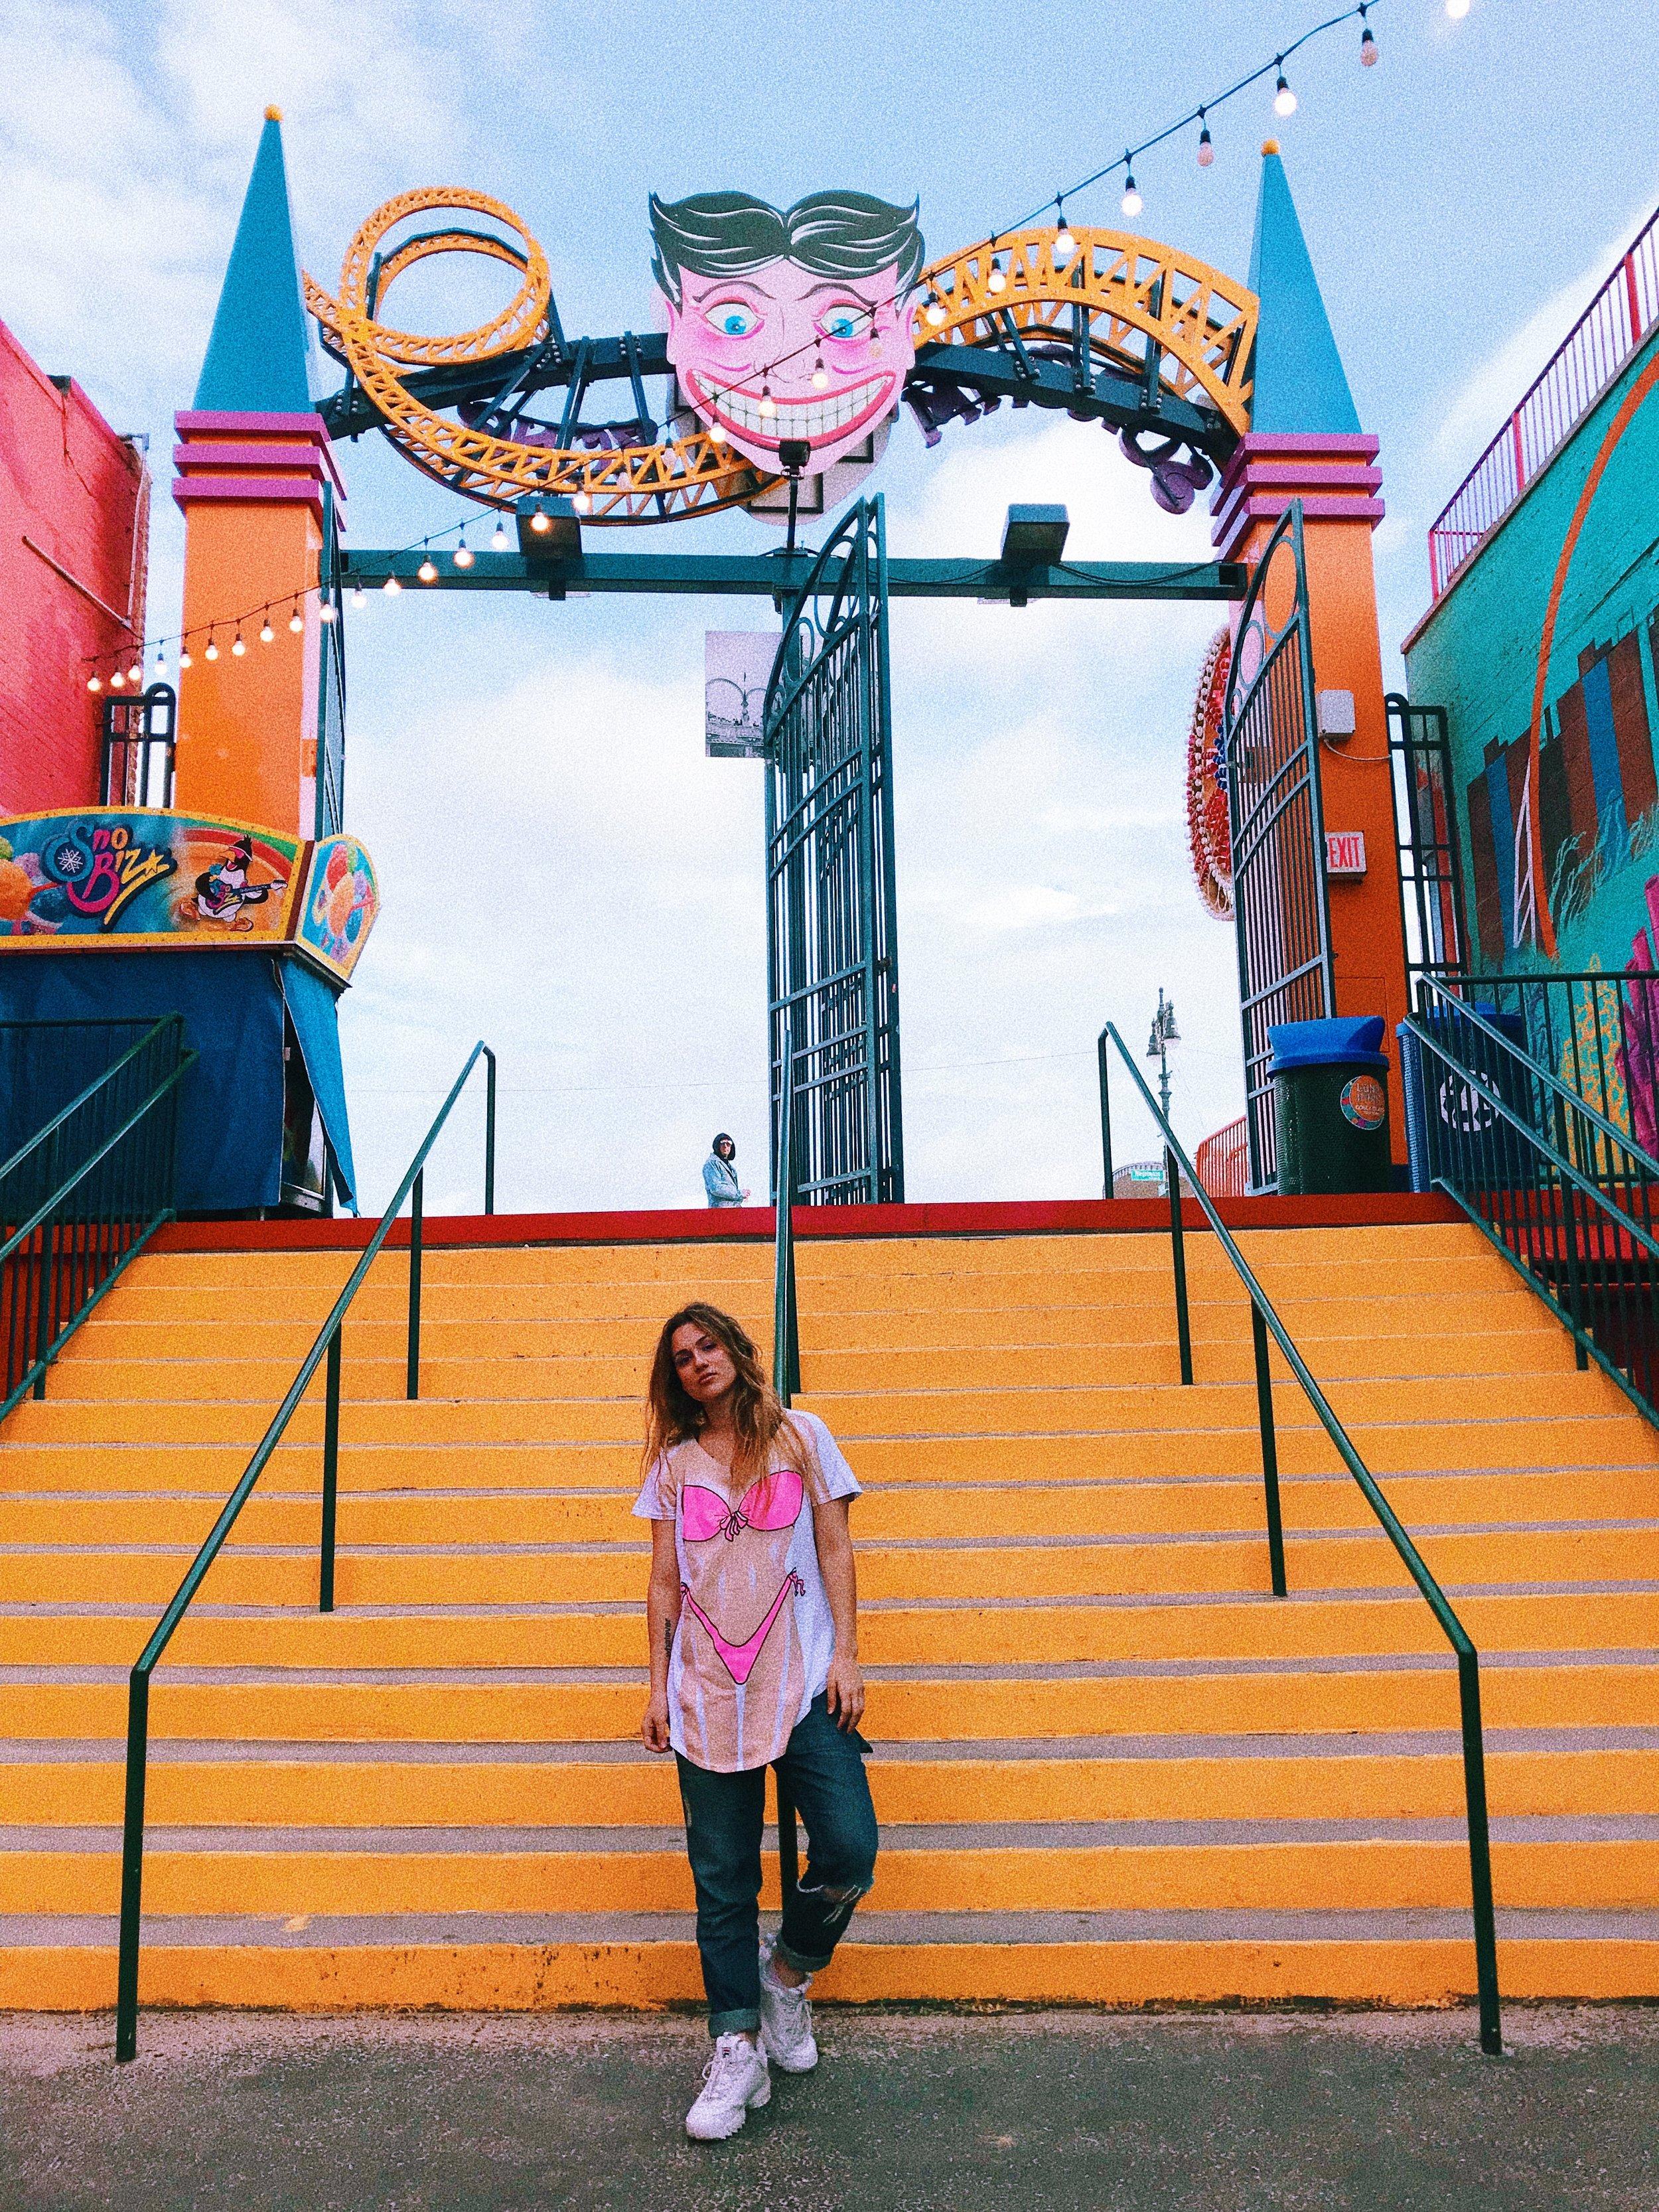 Kat Coney Island Steps